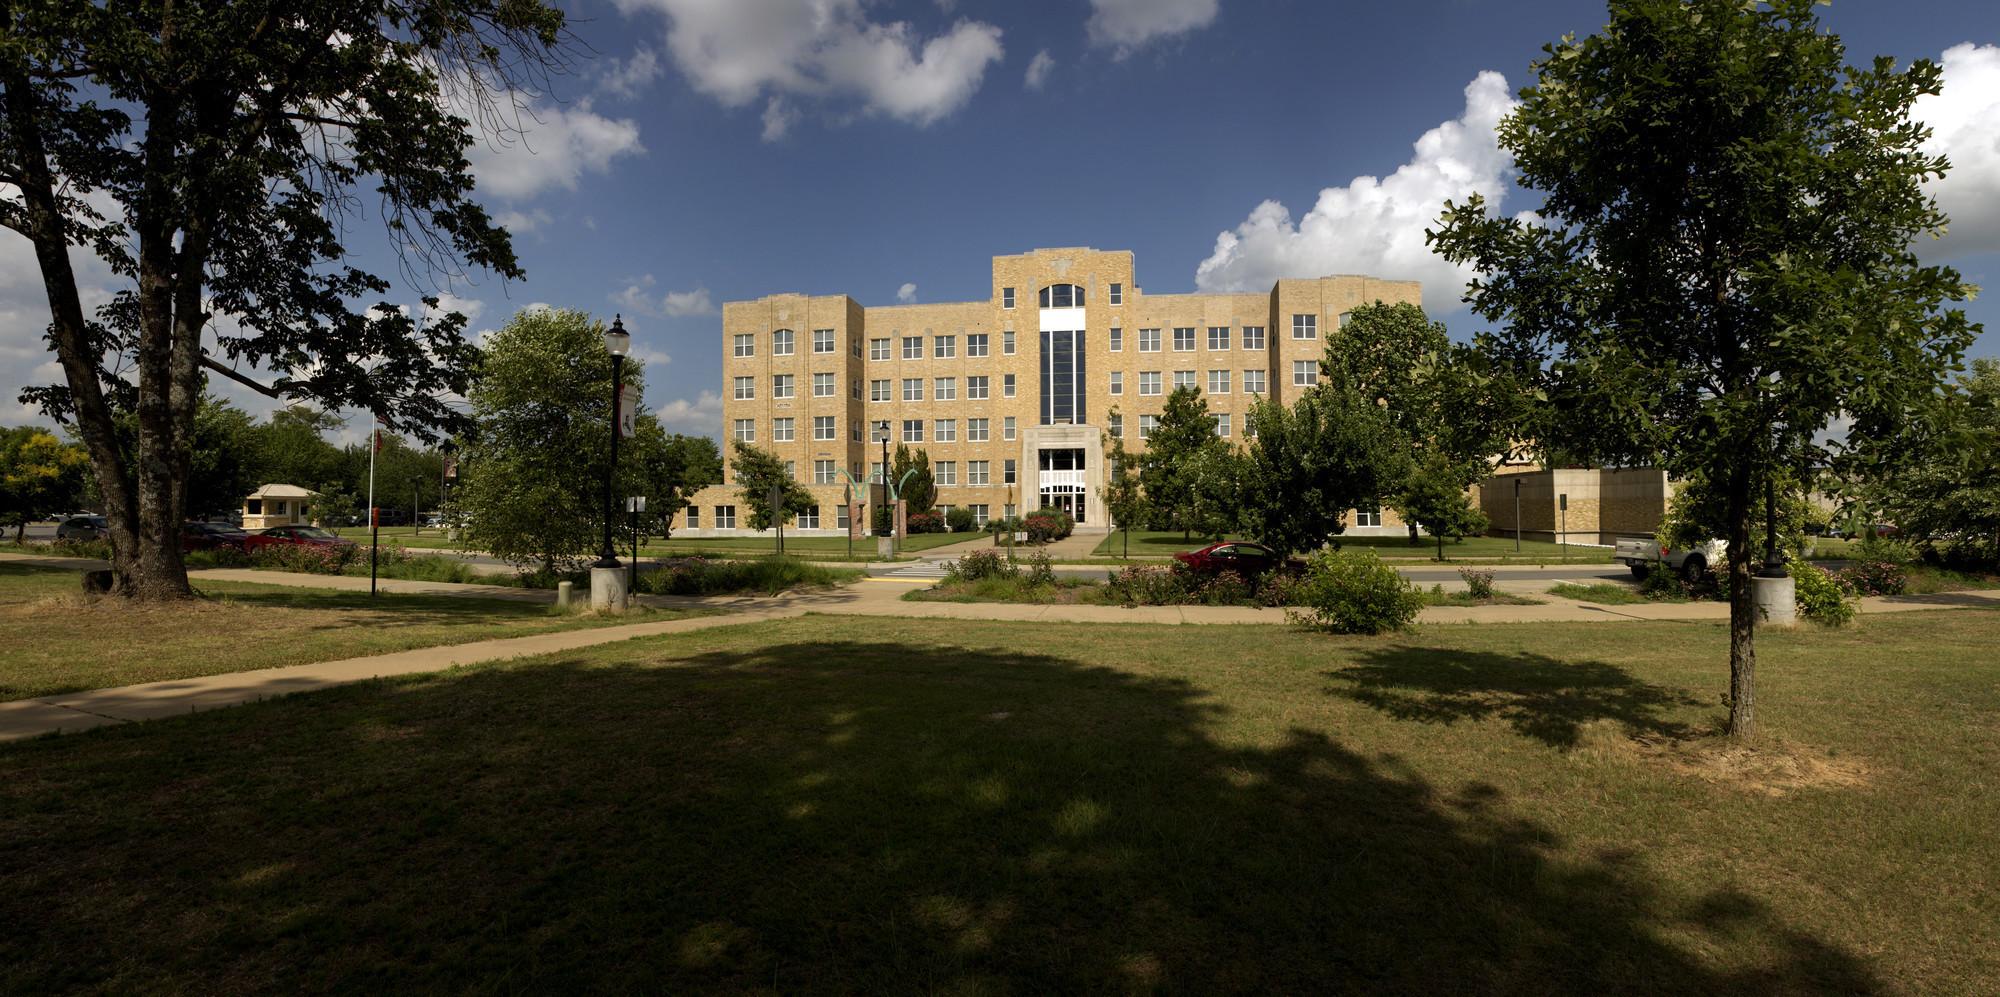 Rs1440 2016 06 24 law school front exterior lpr